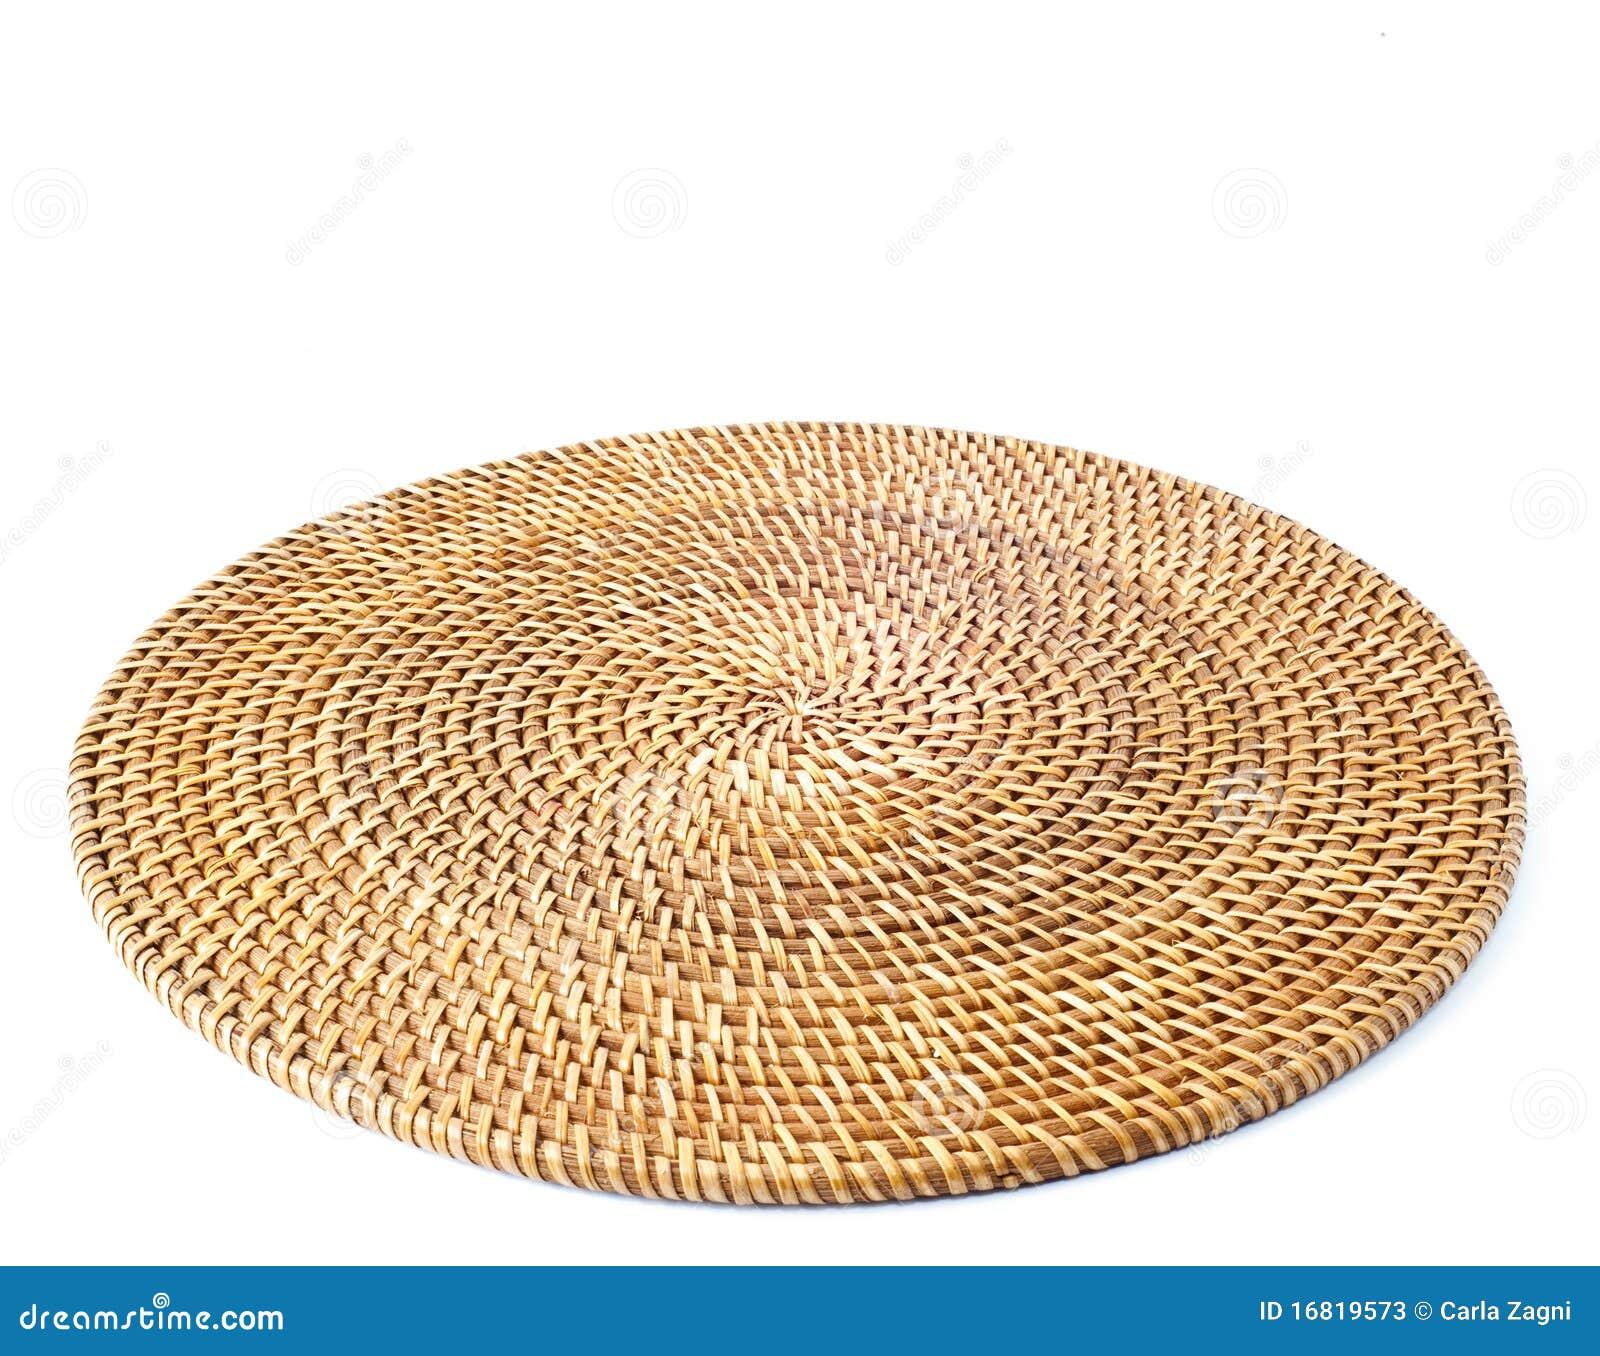 Rattan Round Placemat Stock Photos - Image: 16819573